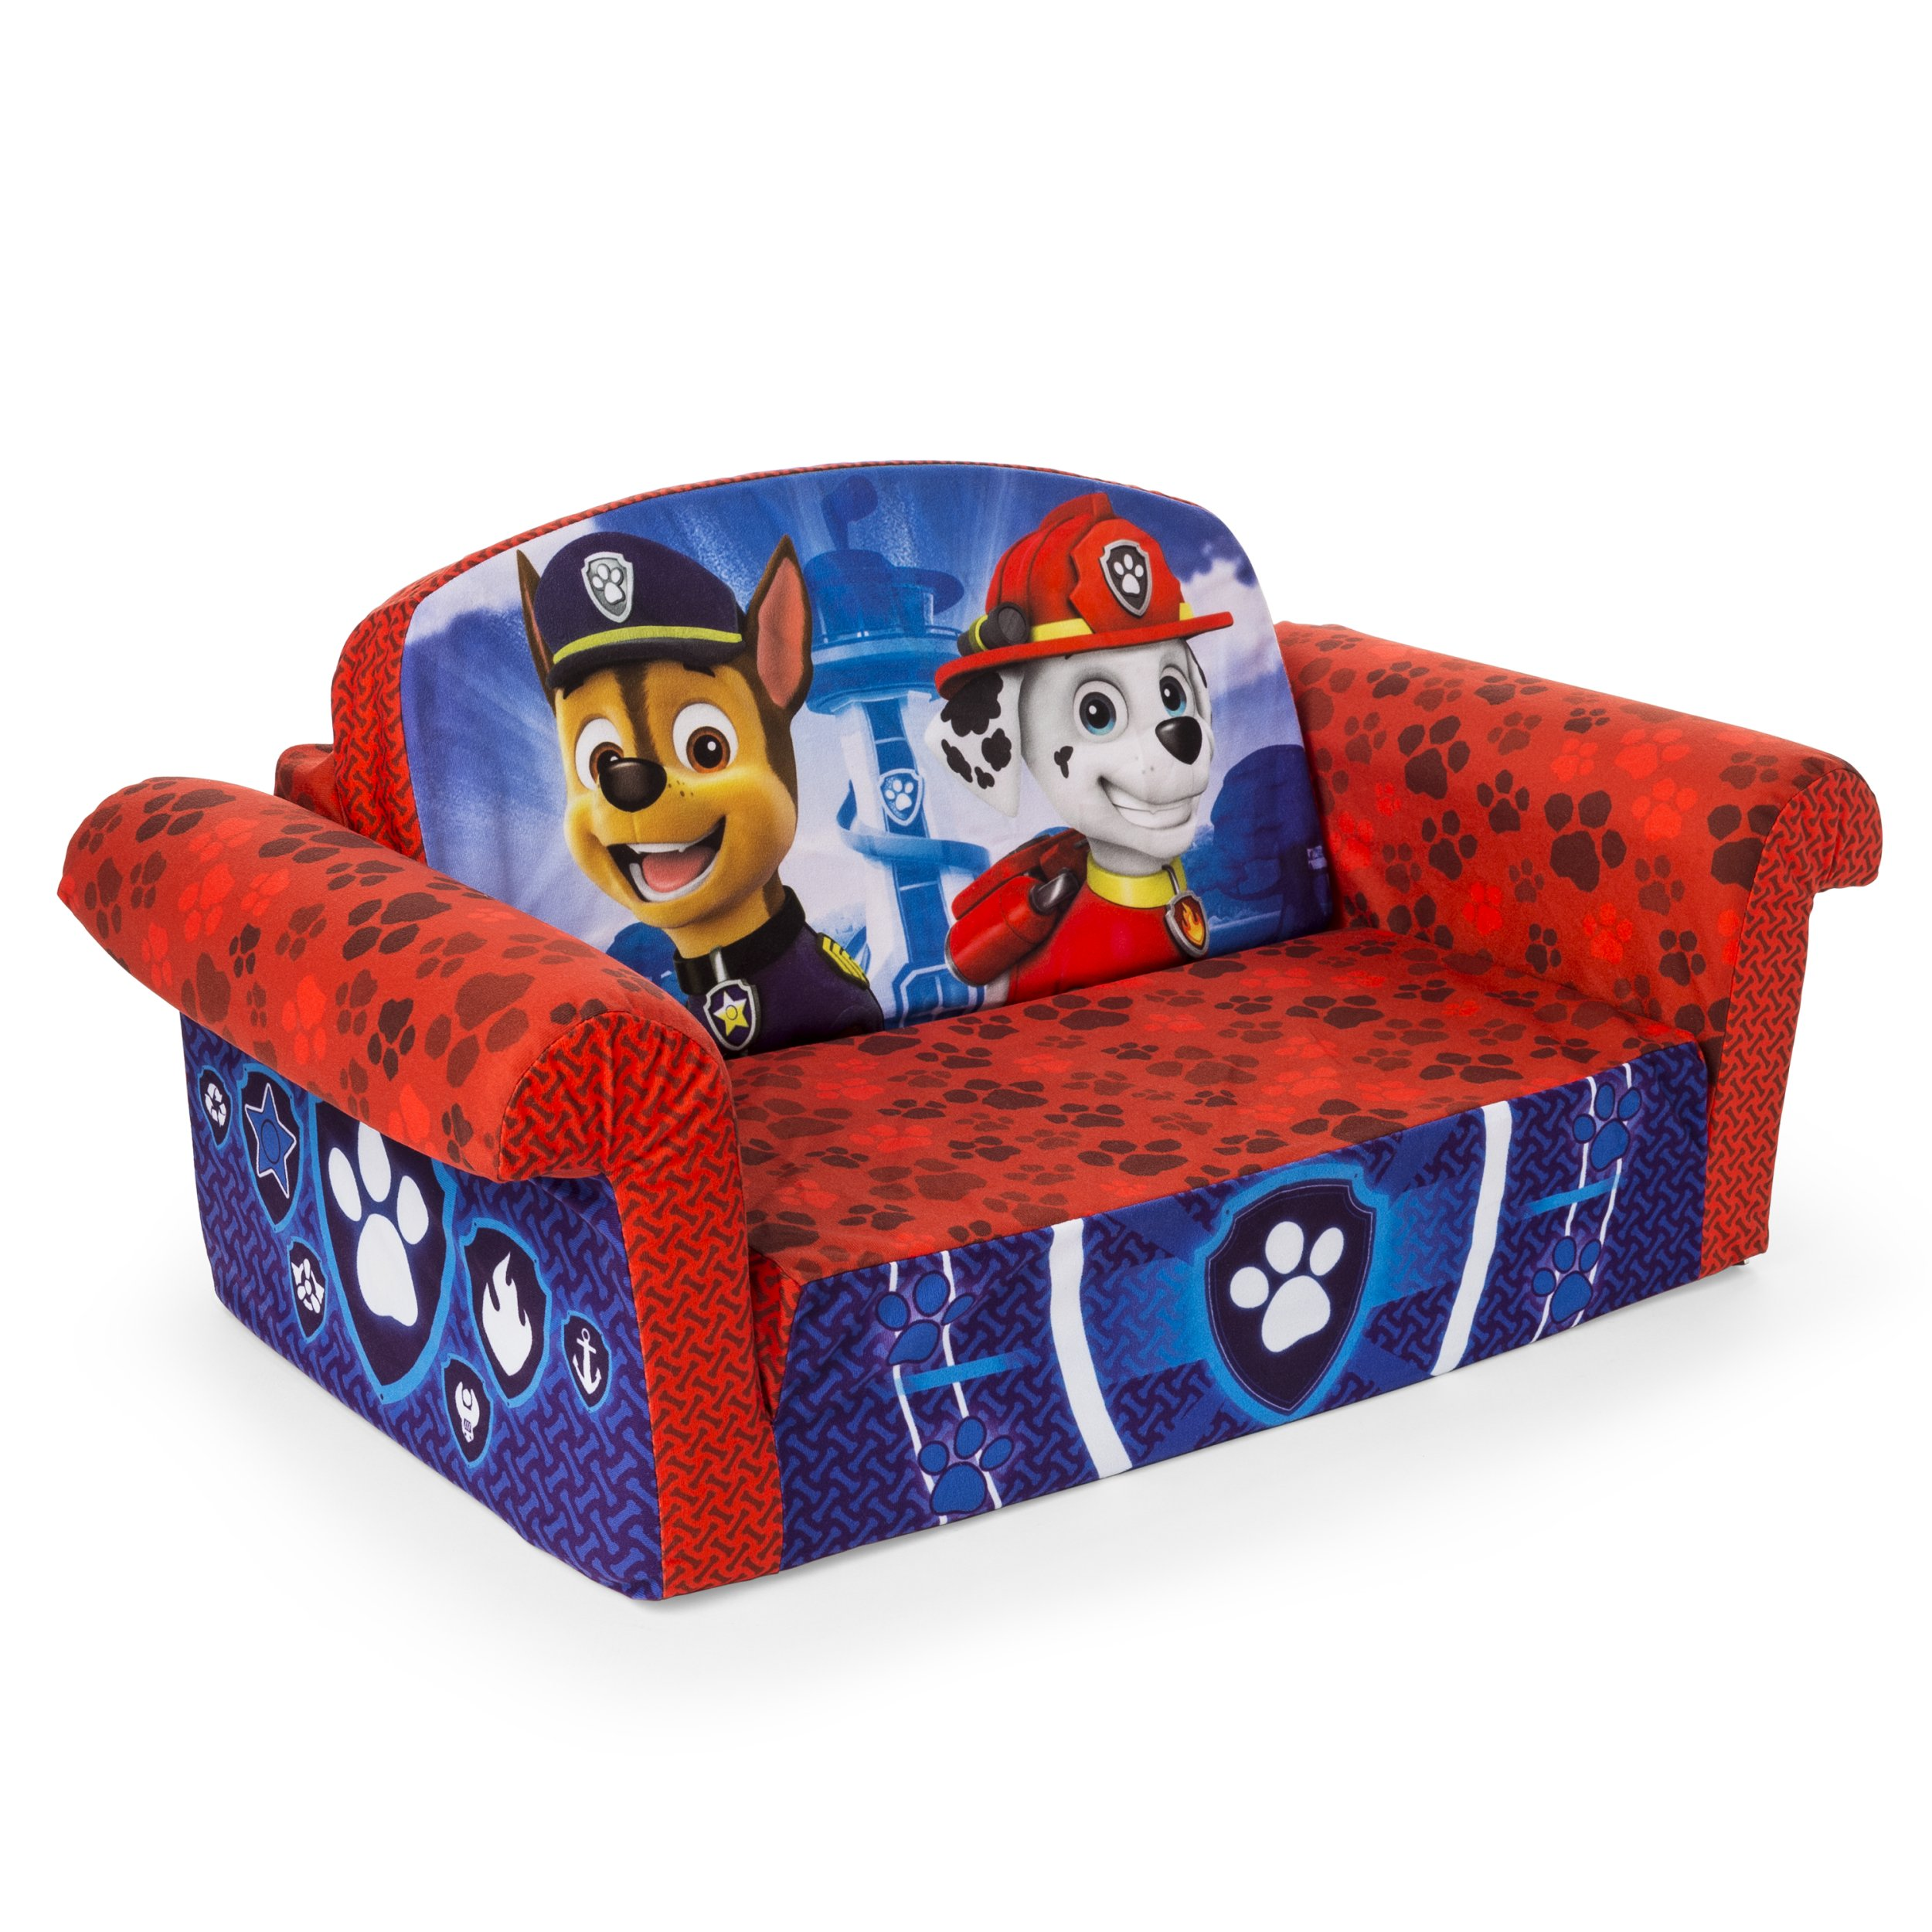 Marshmallow Furniture Children's 2 in 1 Flip Open Foam, Nickelodeon Paw Patrol Sofa Chair Furniture, Red by Marshmallow Furniture (Image #6)